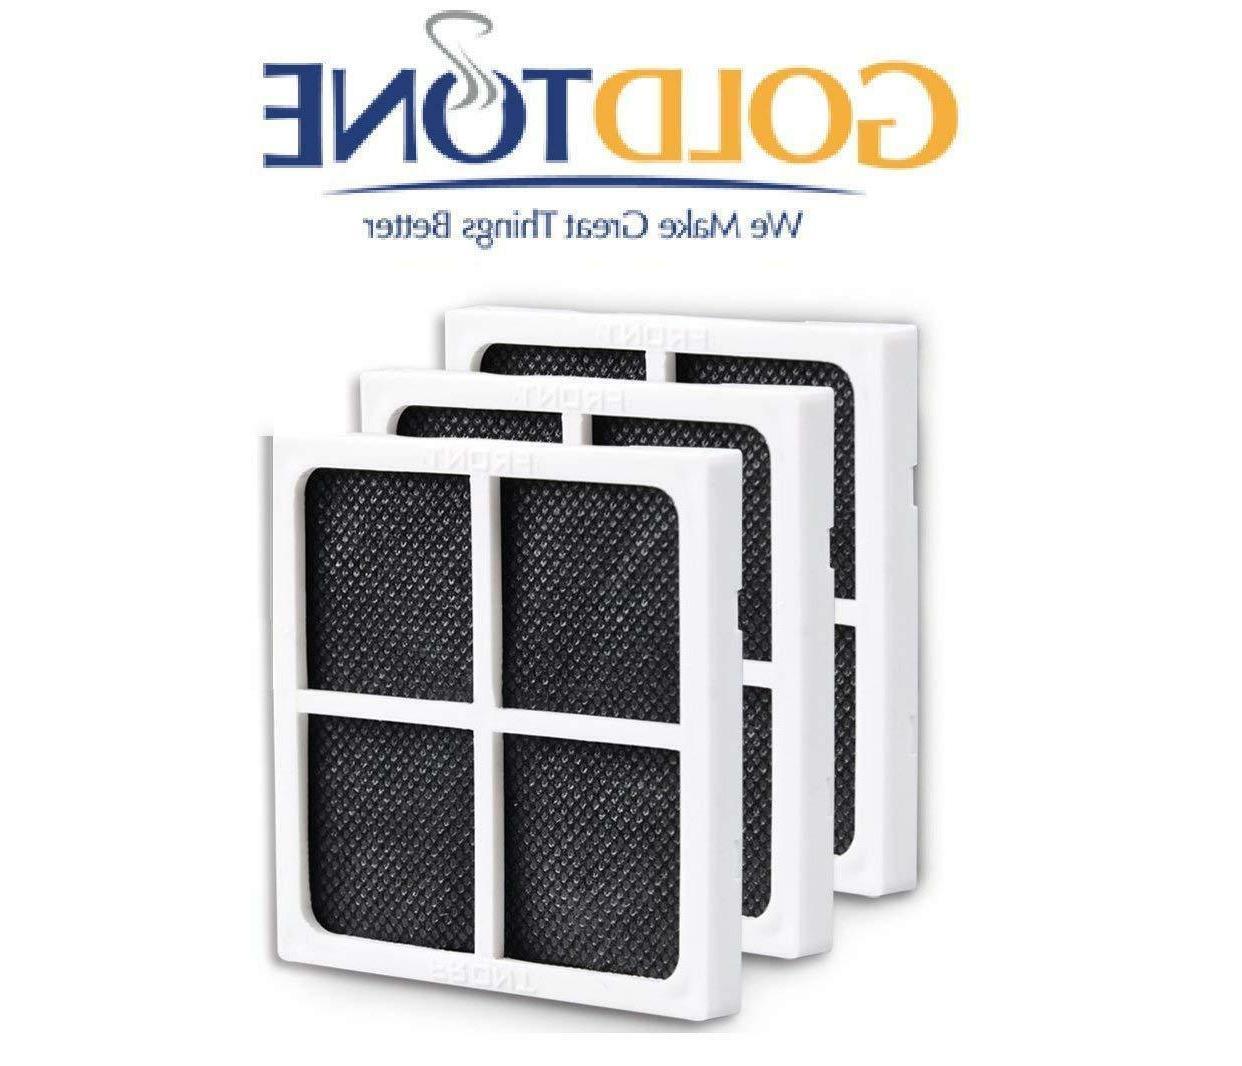 3 PACK  Replacement Refrigerator Air Filter for LG LT120F Ke